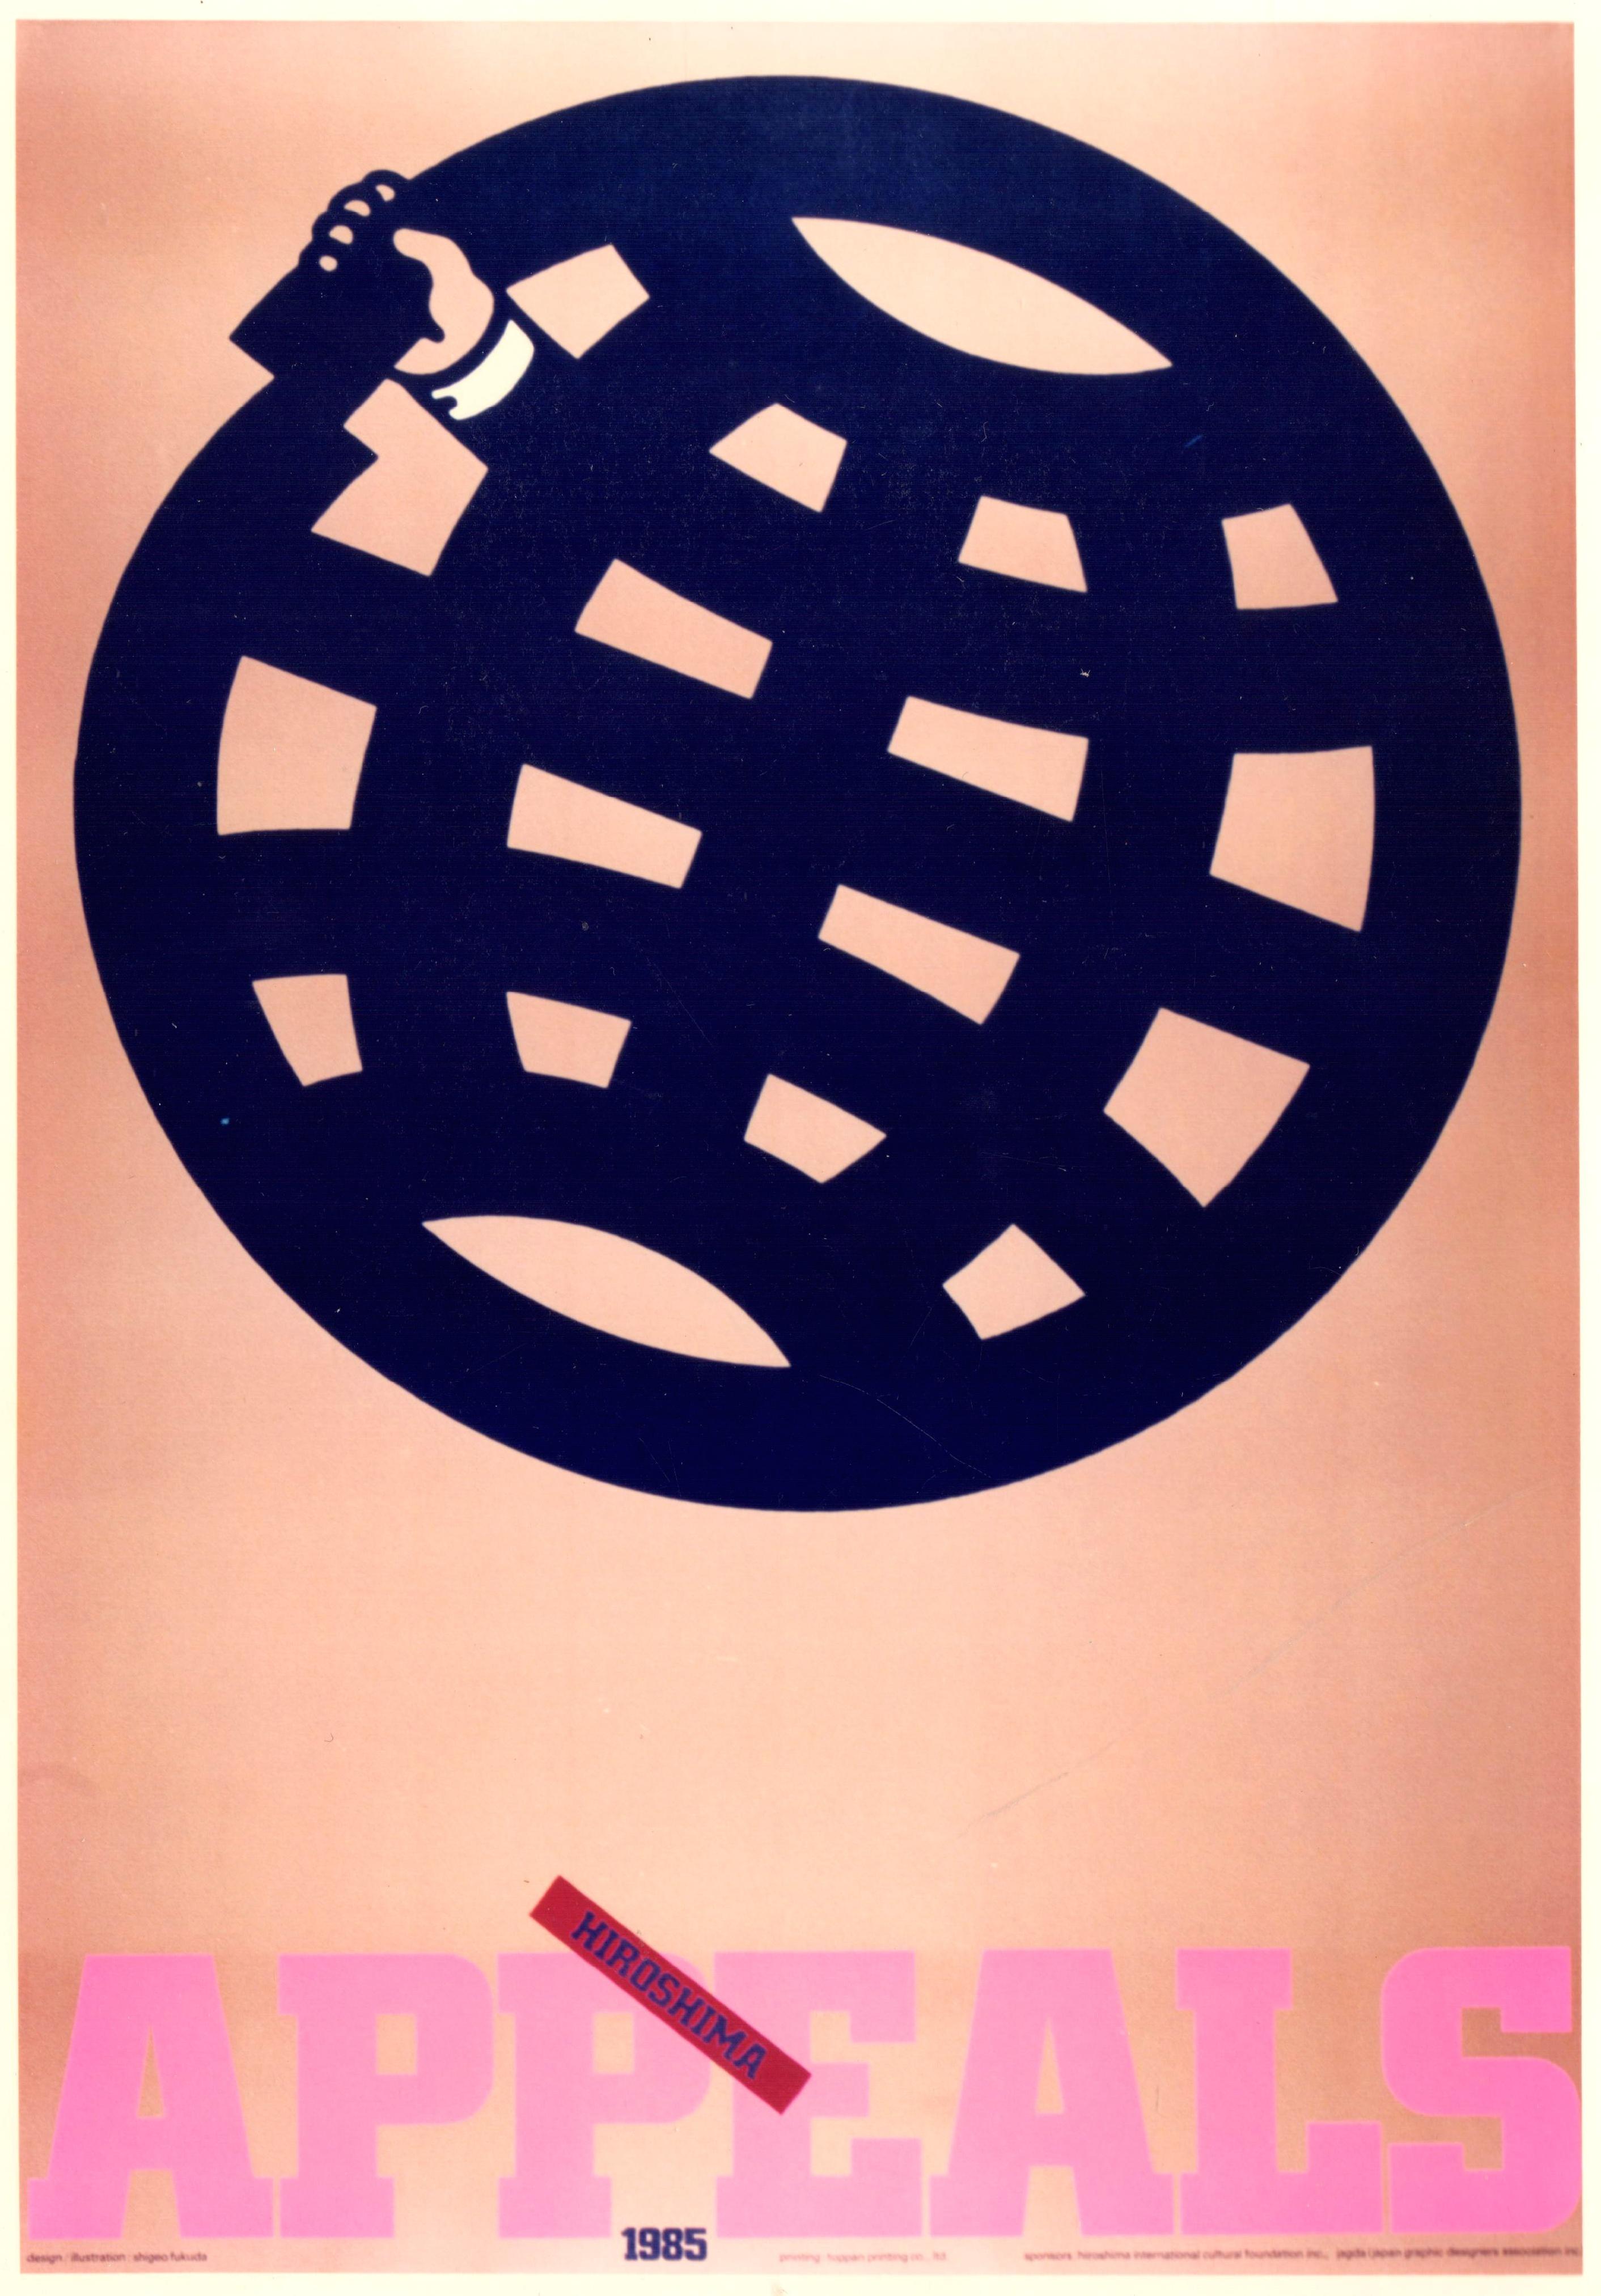 Poster-Hiroshima Appeals (1985) - Shigeo Fukuda-02